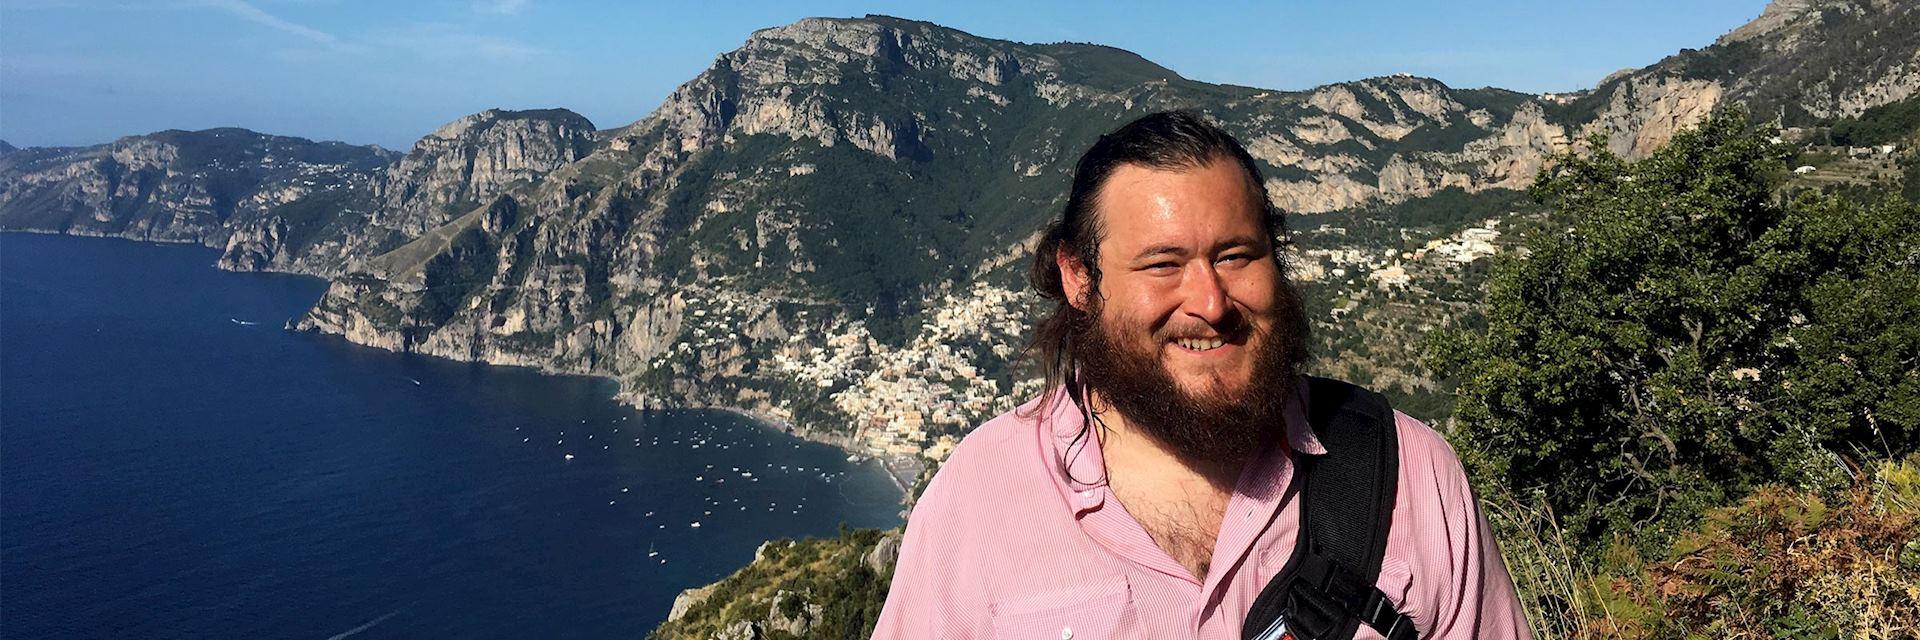 Evan visiting the Amalfi Coast, Italy